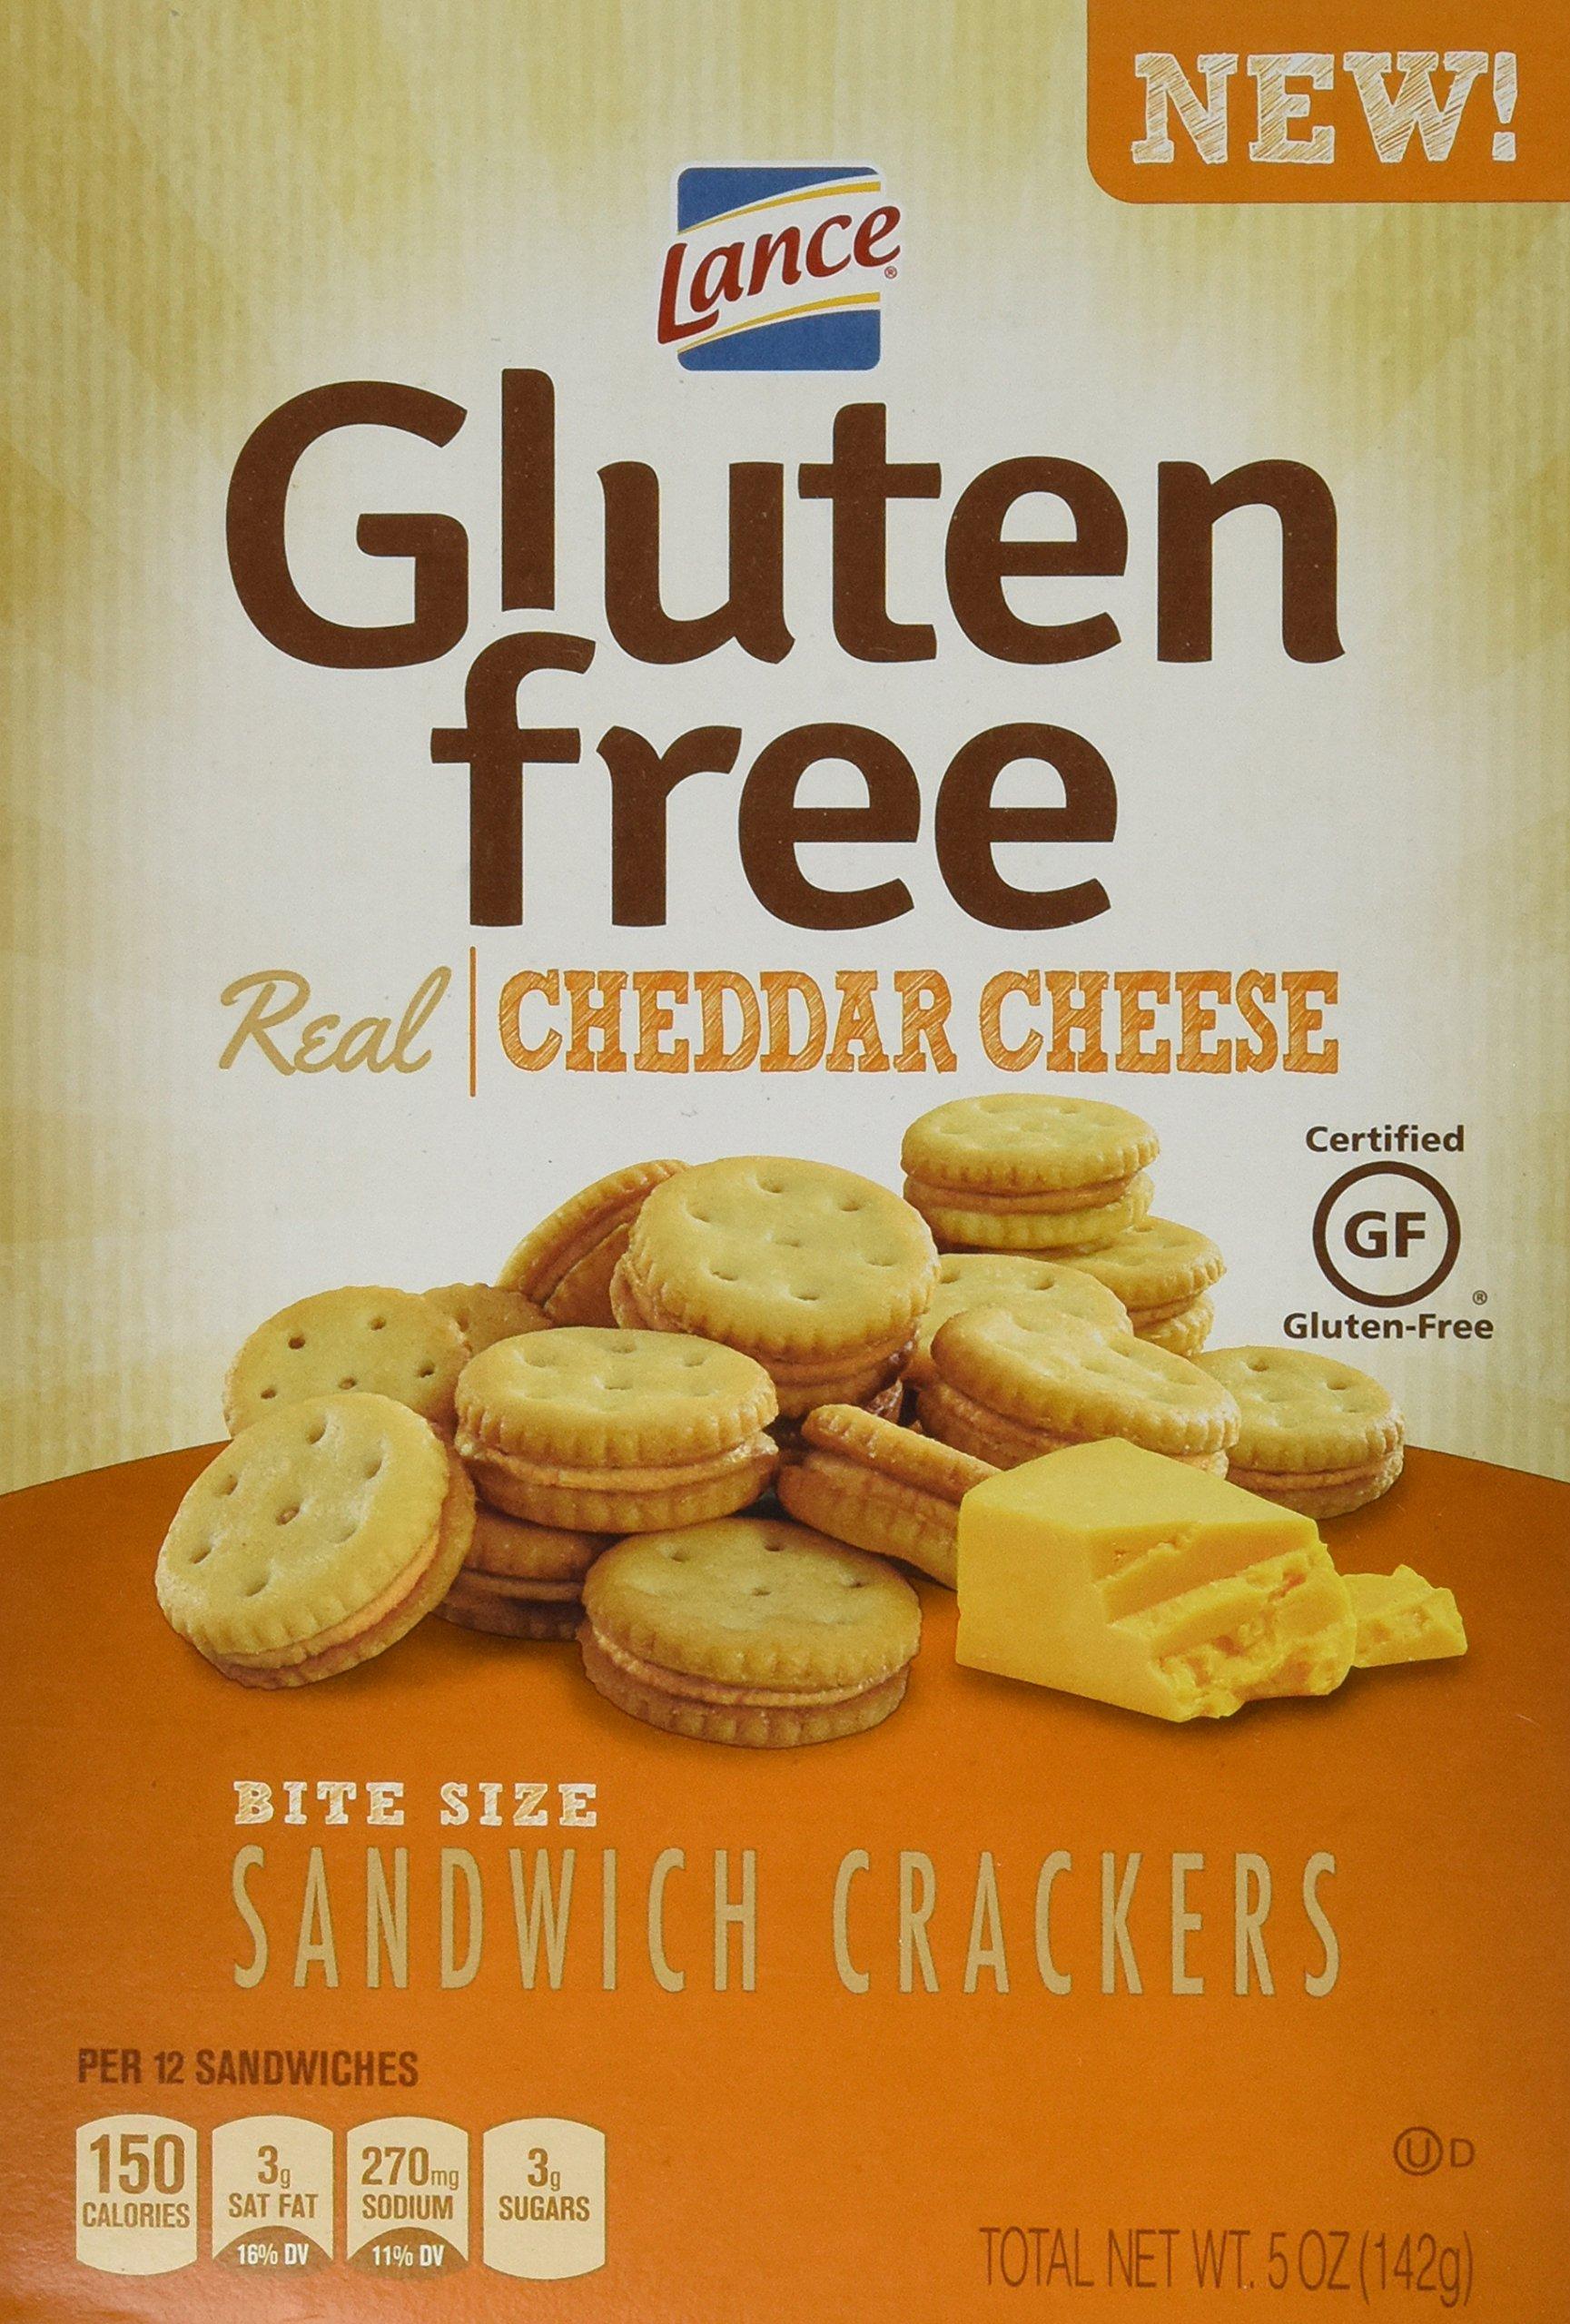 Lance Gluten Free Cheddar Bite Sized Sandwich Snack Crackers 5 Oz Box [4 Pack]